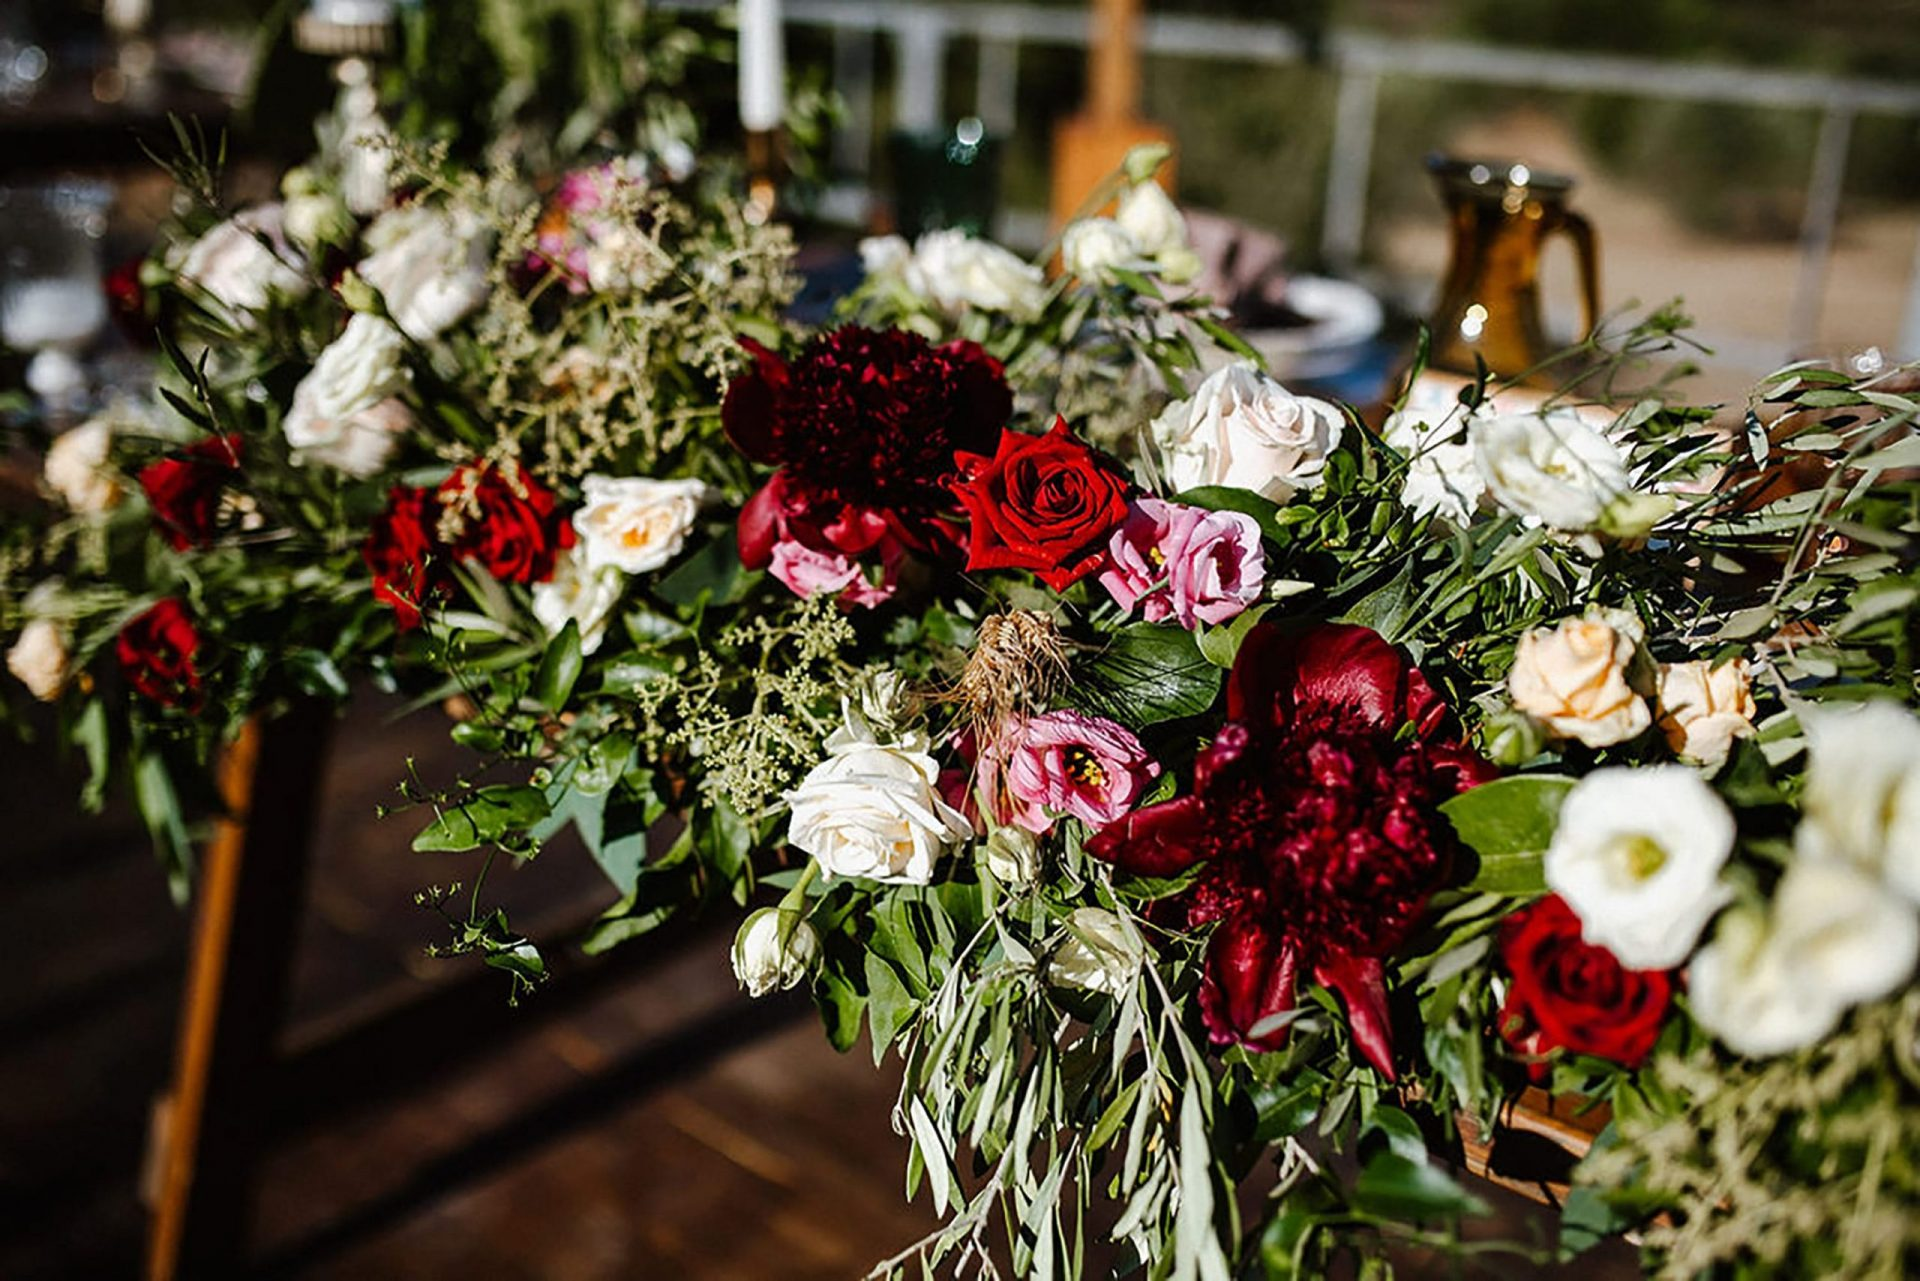 Marianna & Matteo, rustic flowers arrangements